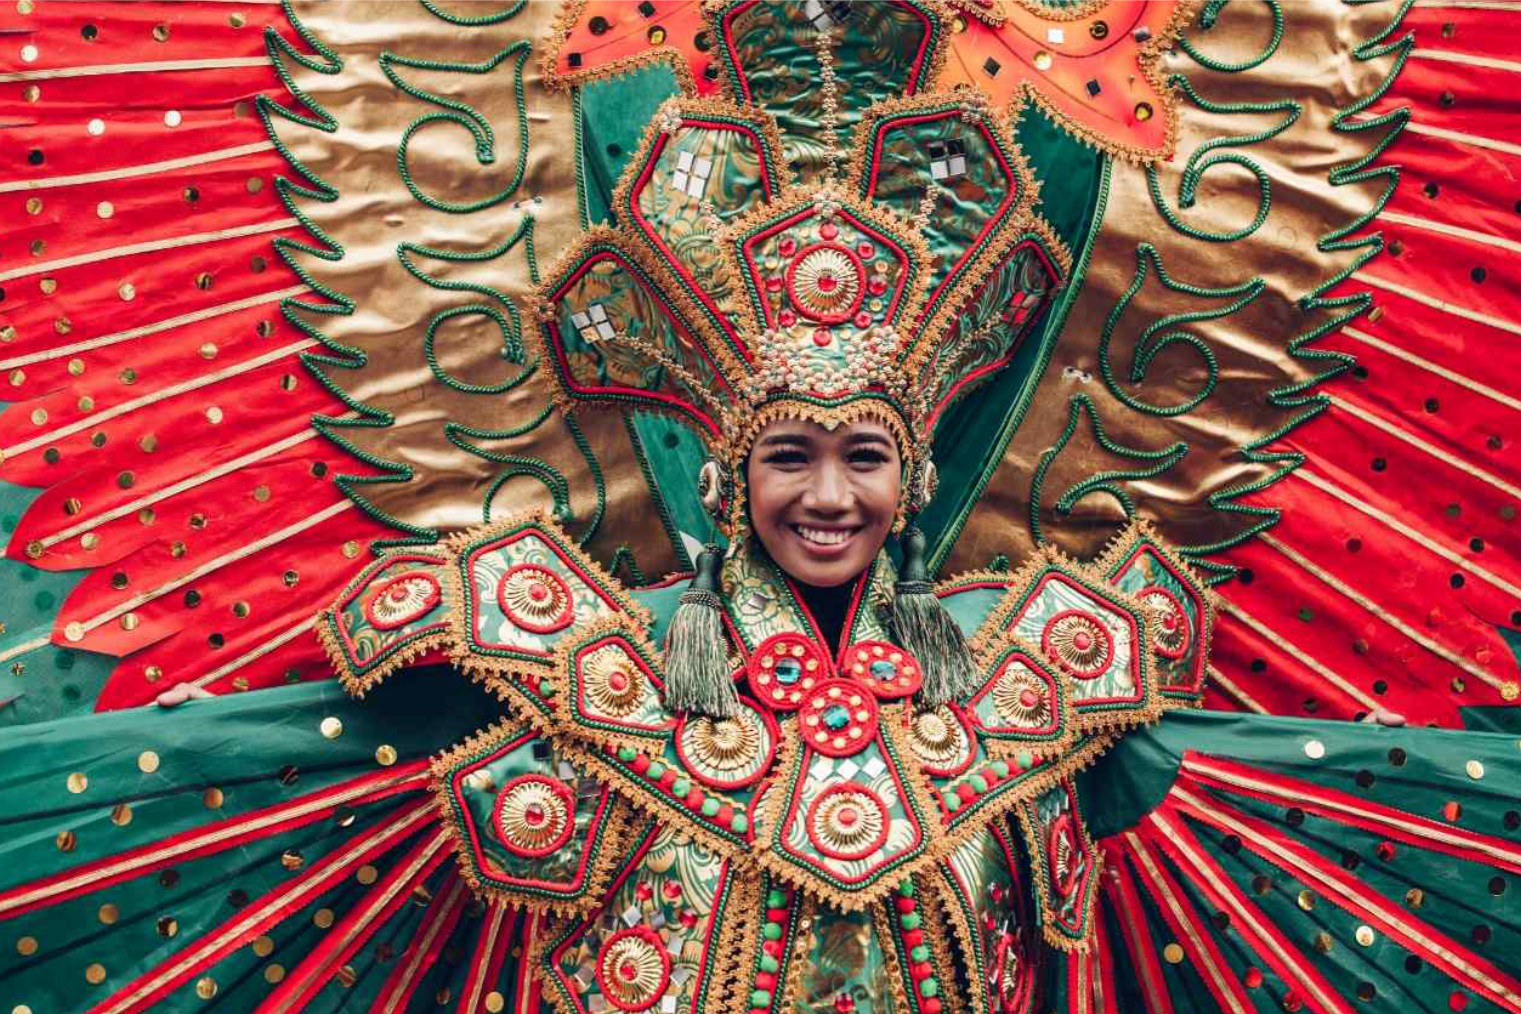 Philippines travel. Филиппины - туристический справочник